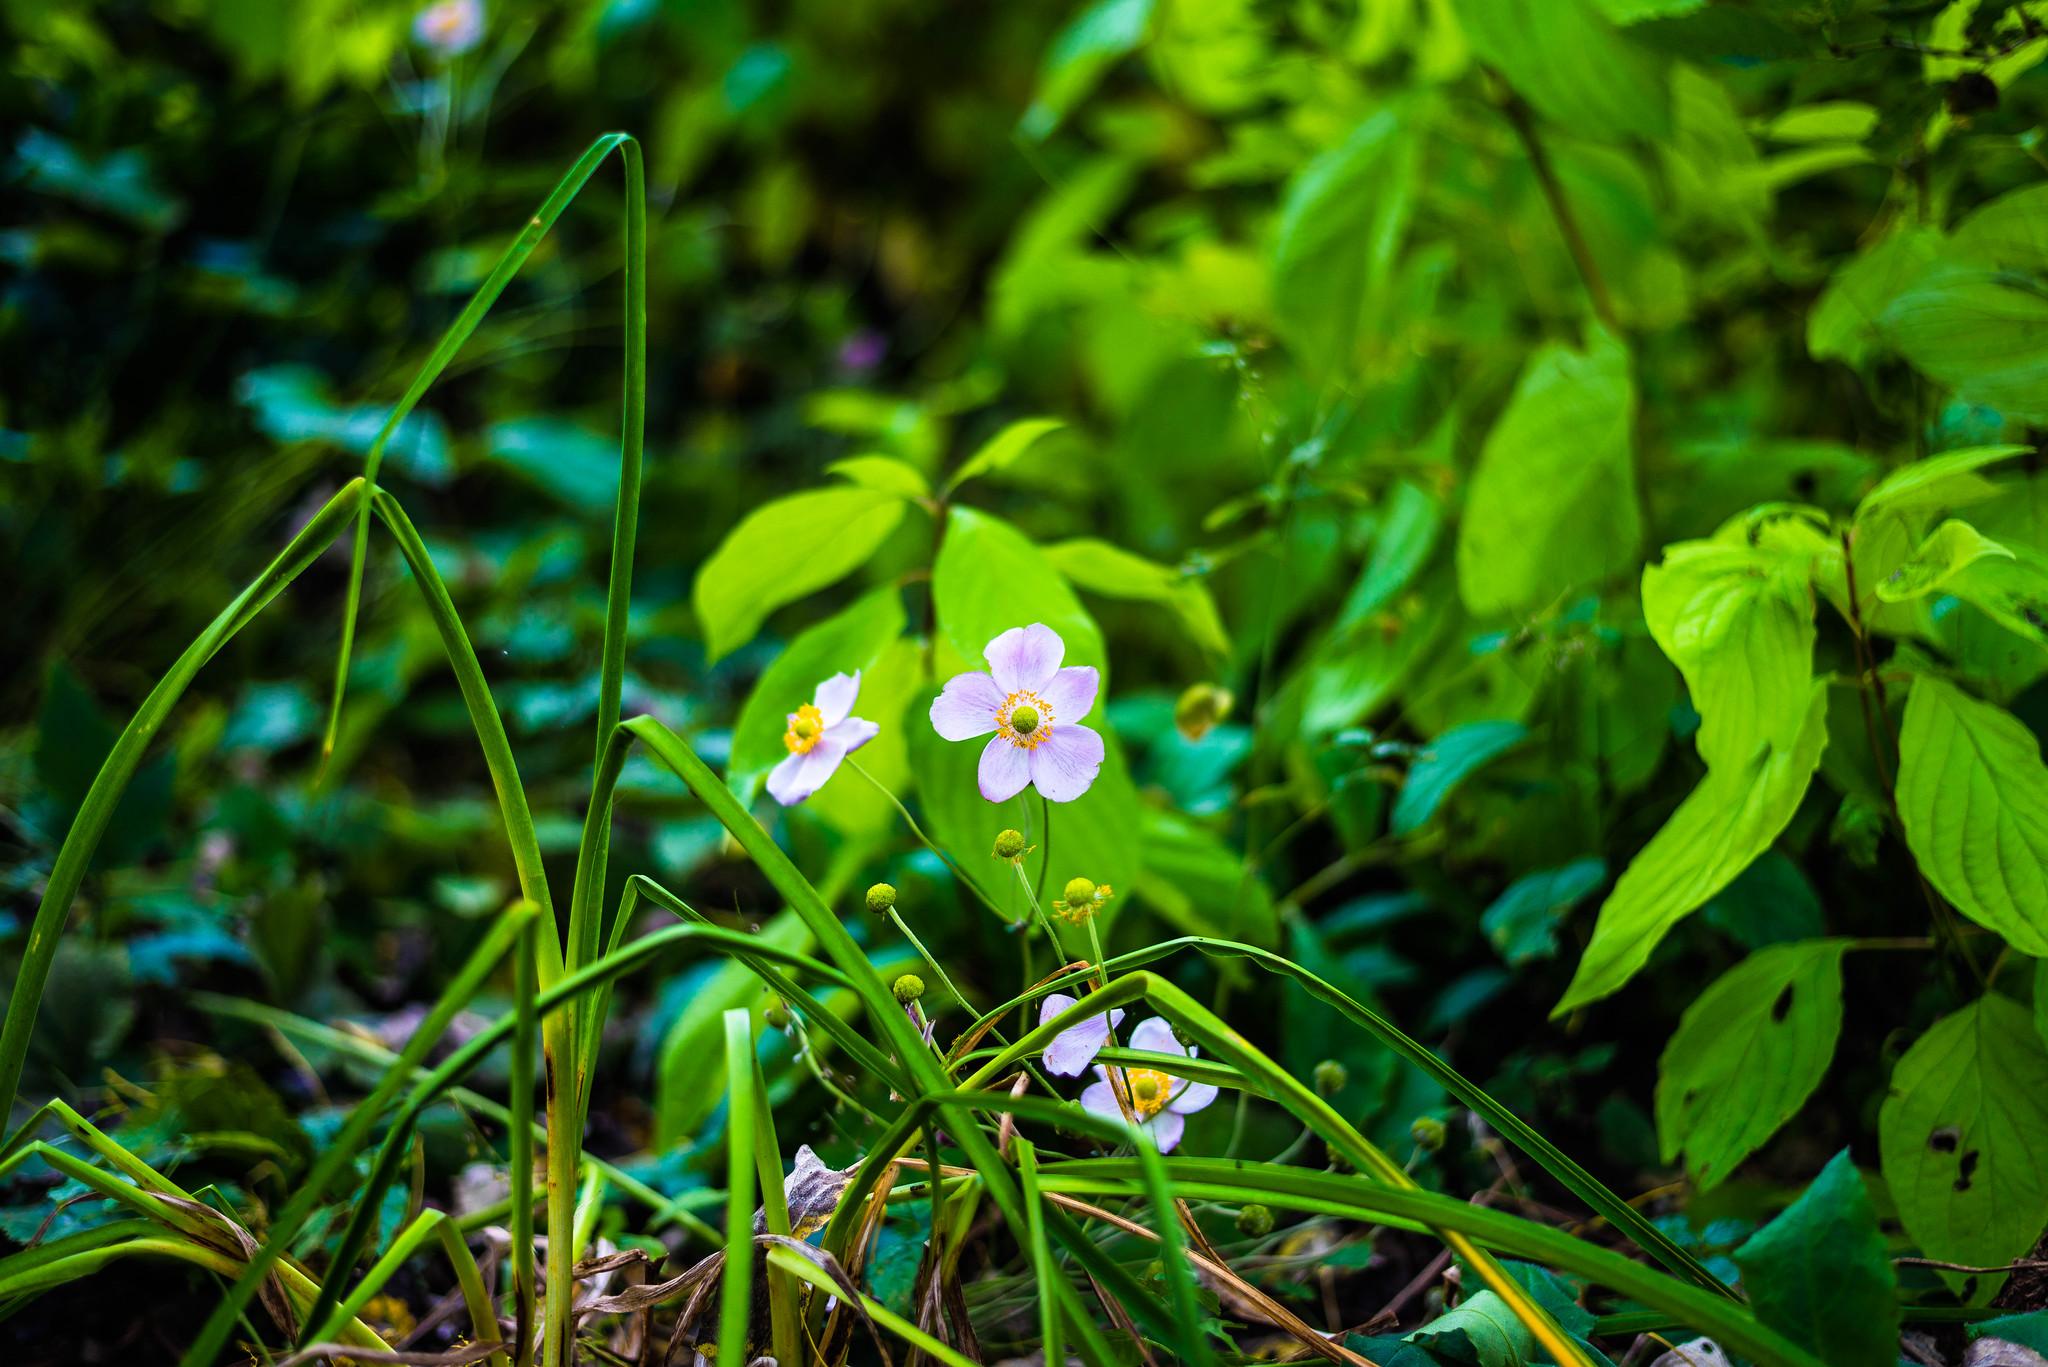 The Wildflowers are still peeking through